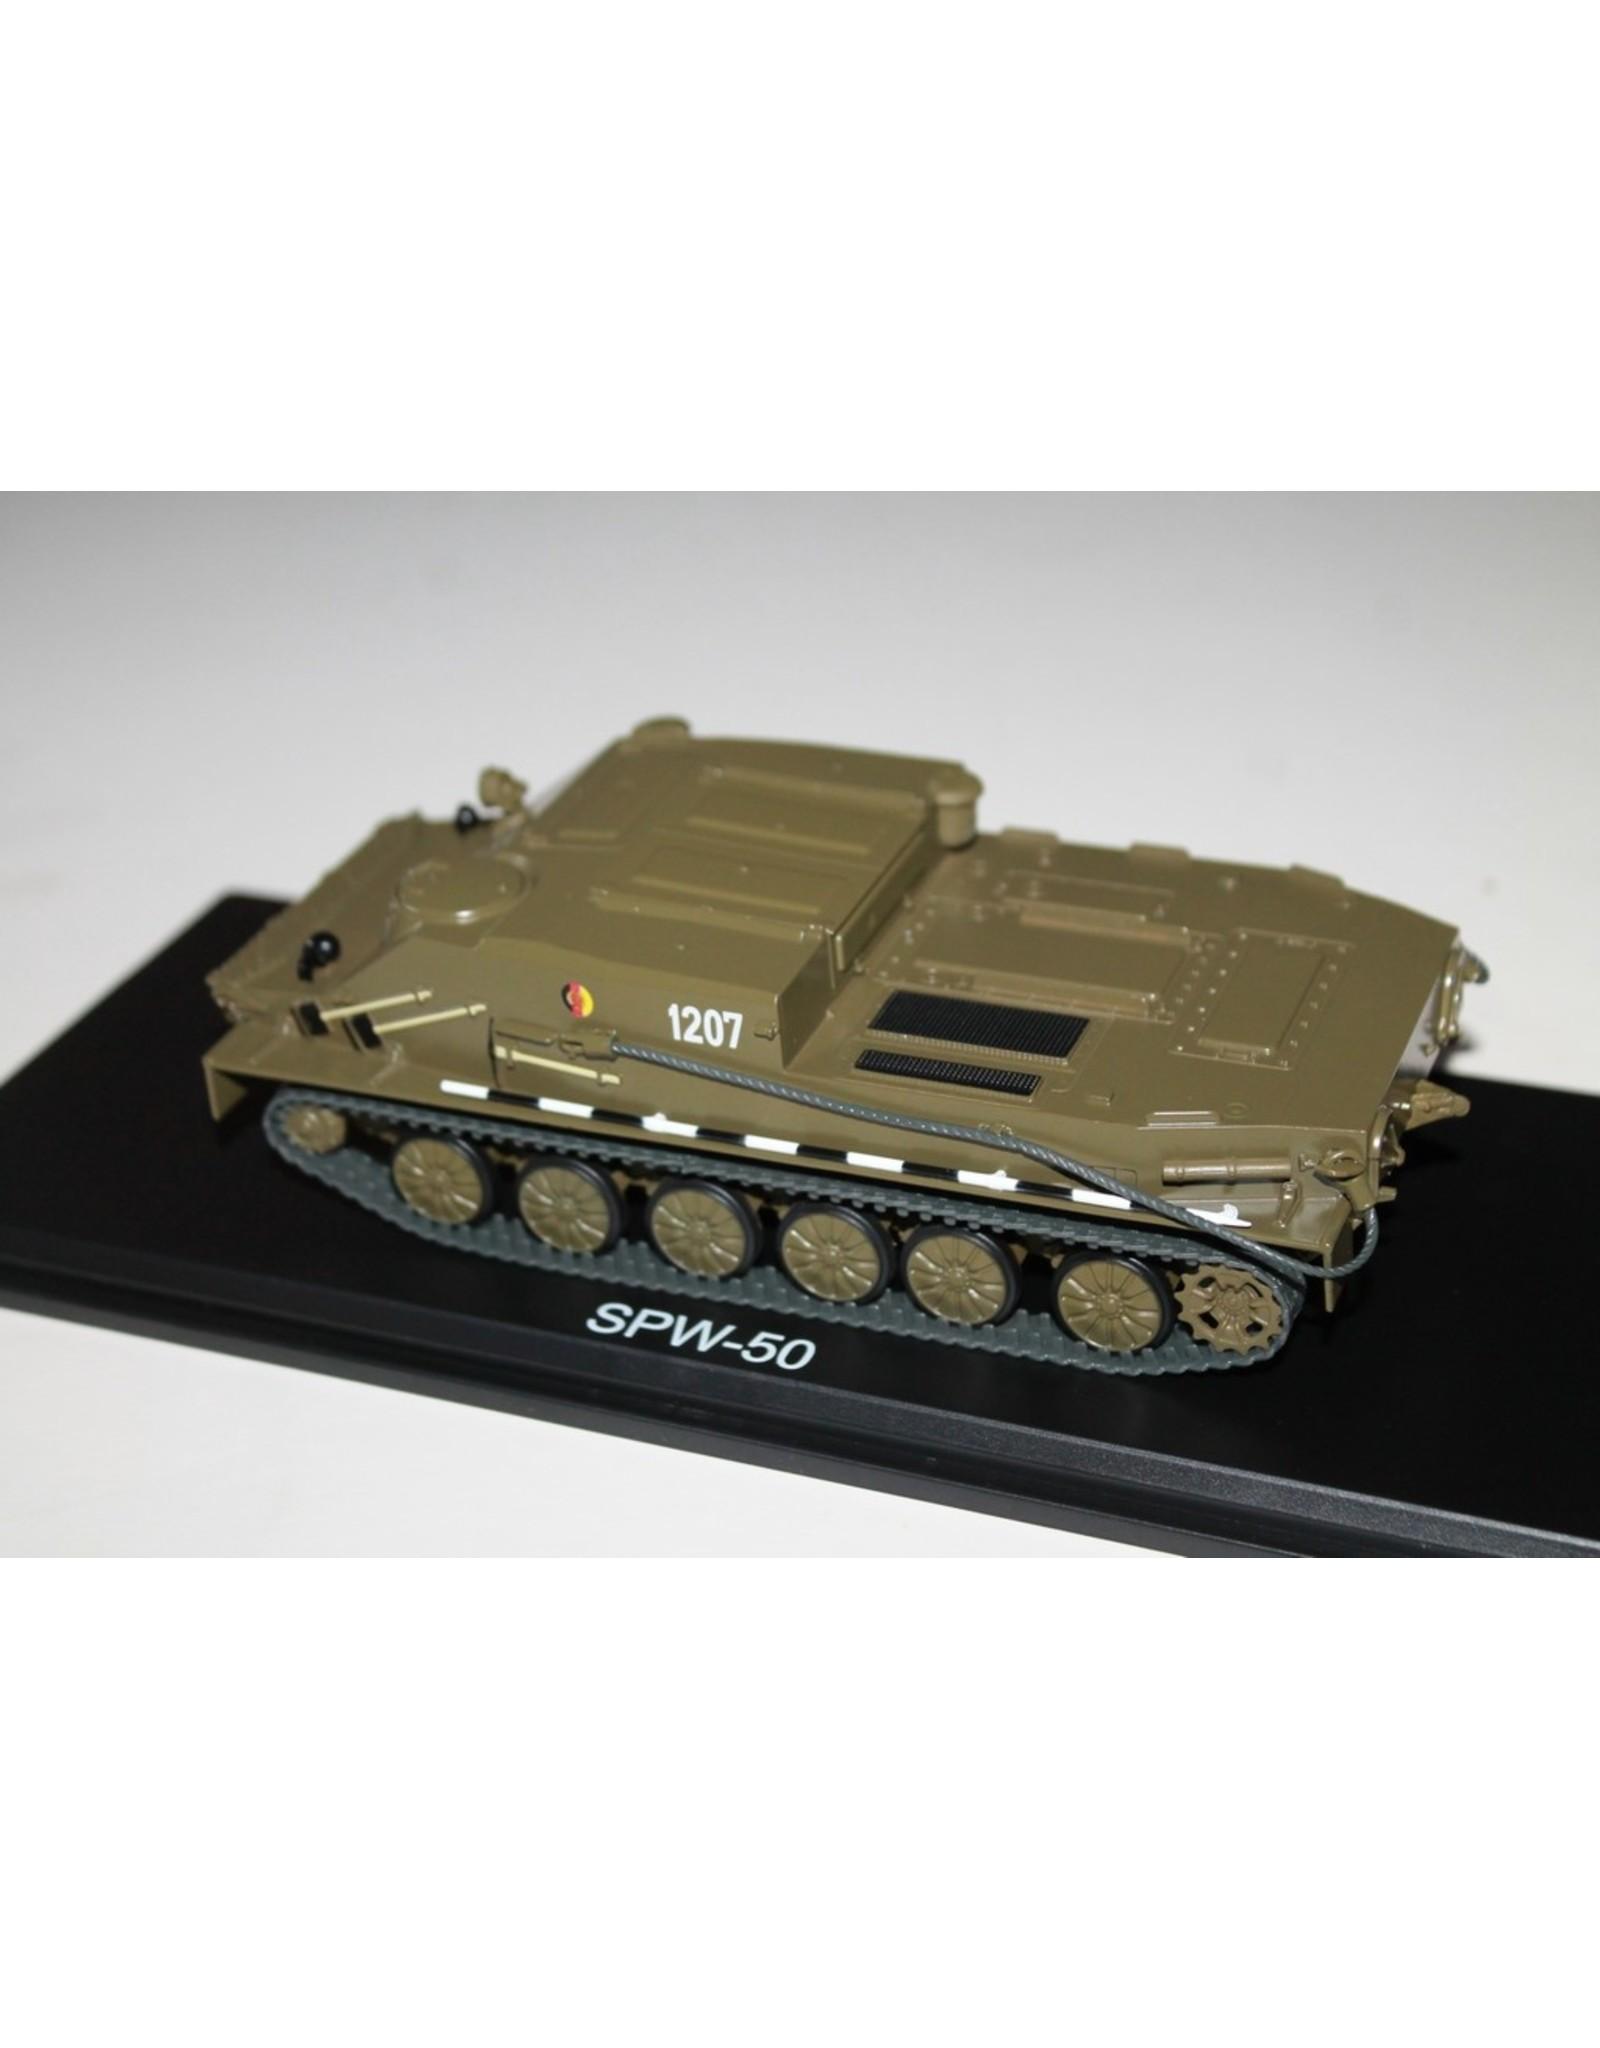 Panzer Panzer SPW-50 NVA - 1:43 - Premium ClassiXXs